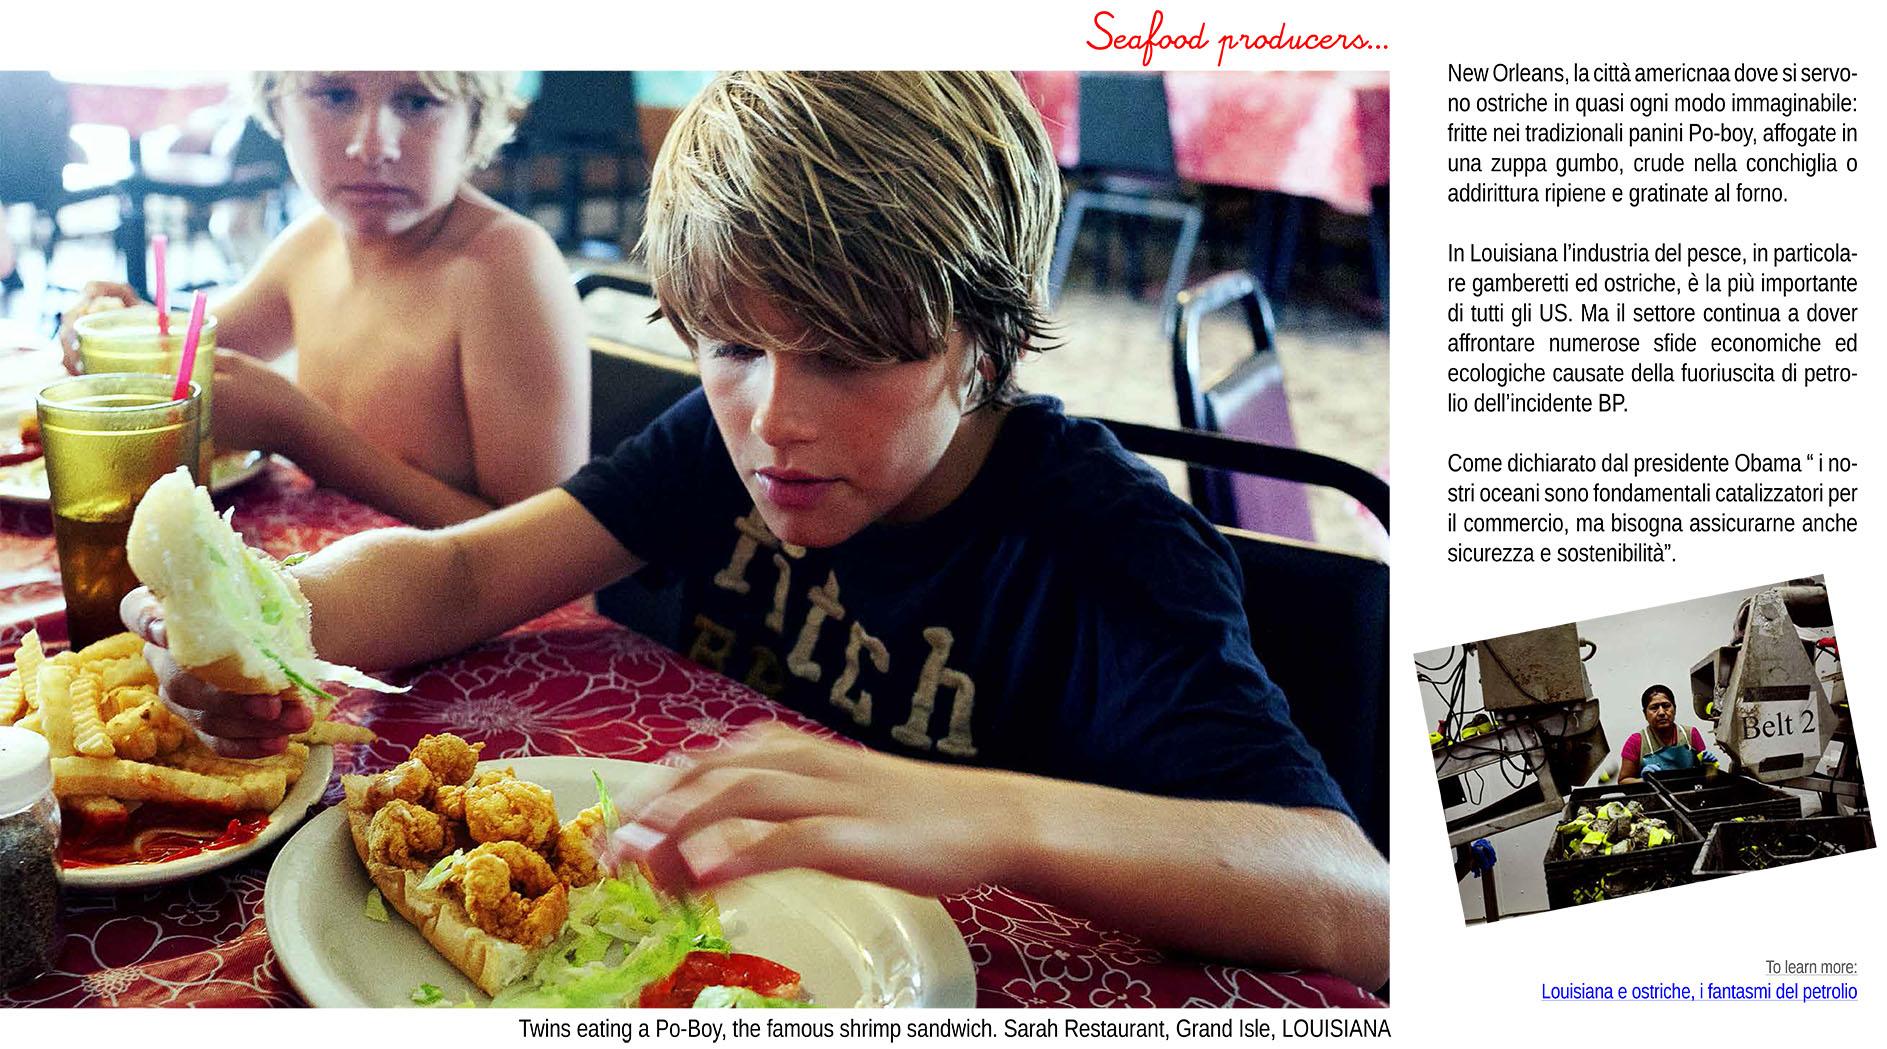 Giada connestari photographe et pilote de drone archive for American cuisine culture